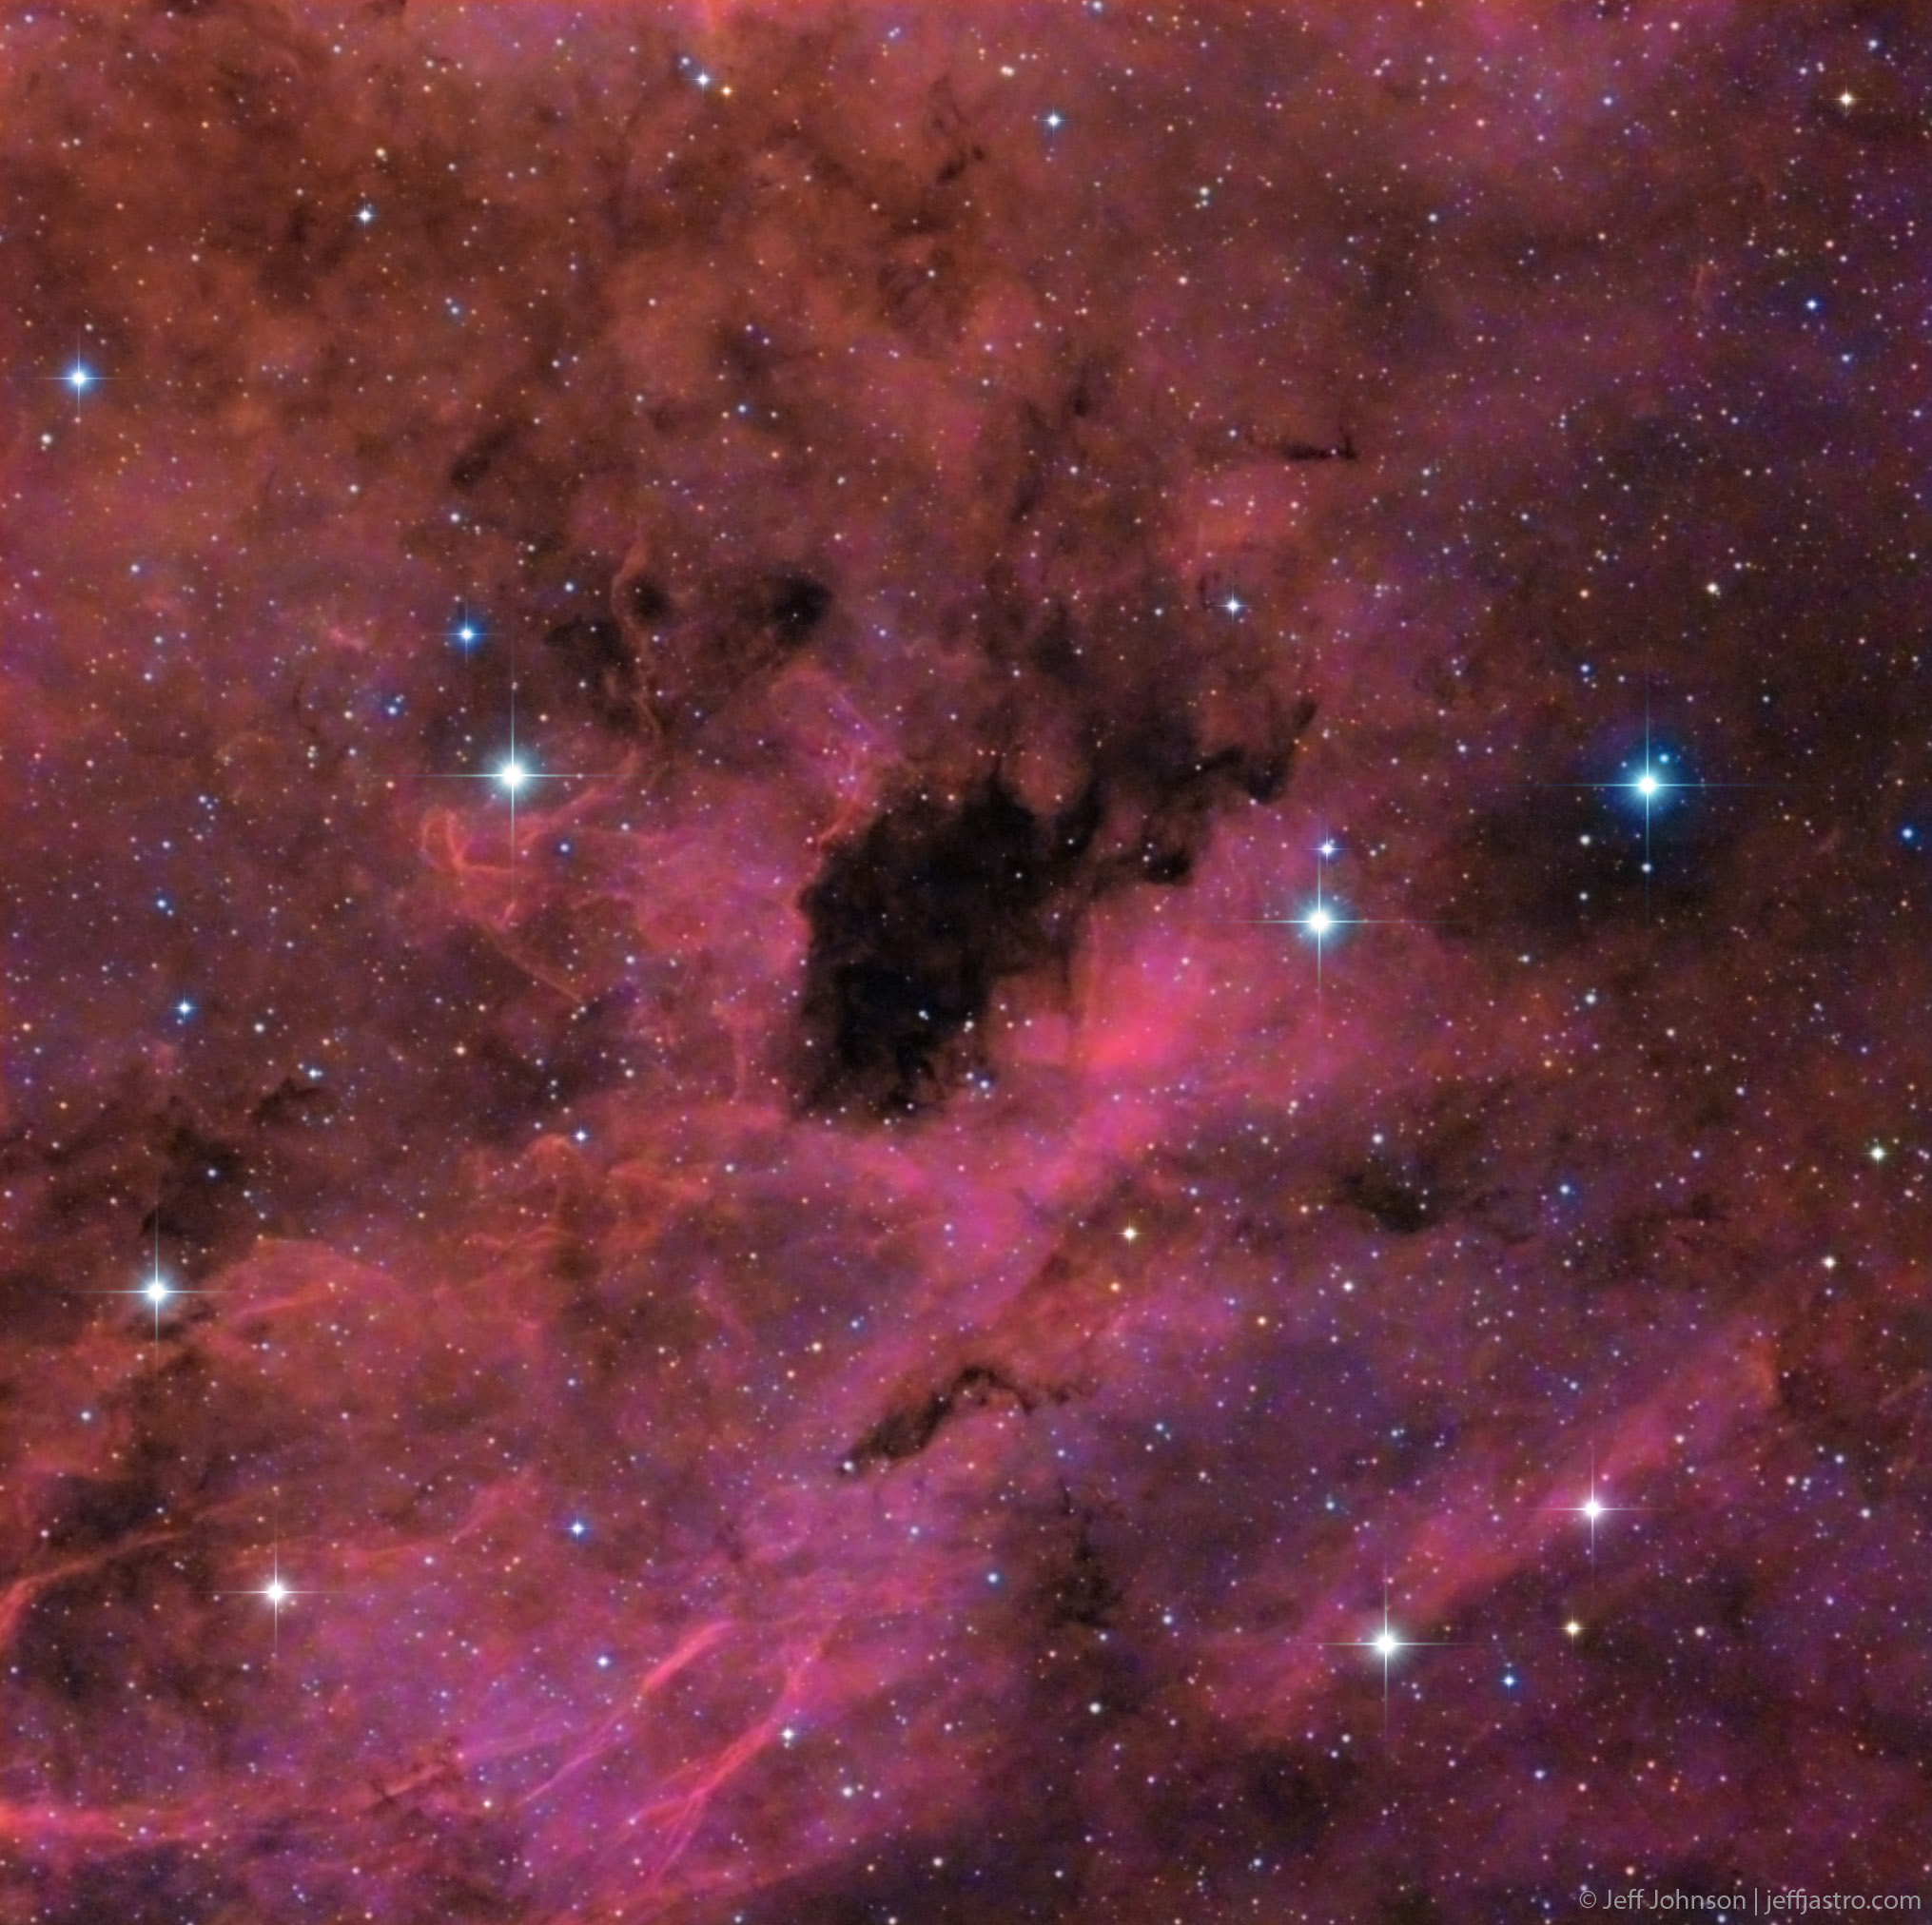 Dark Nebula Glows Red in Amateur Astronomer's Photo